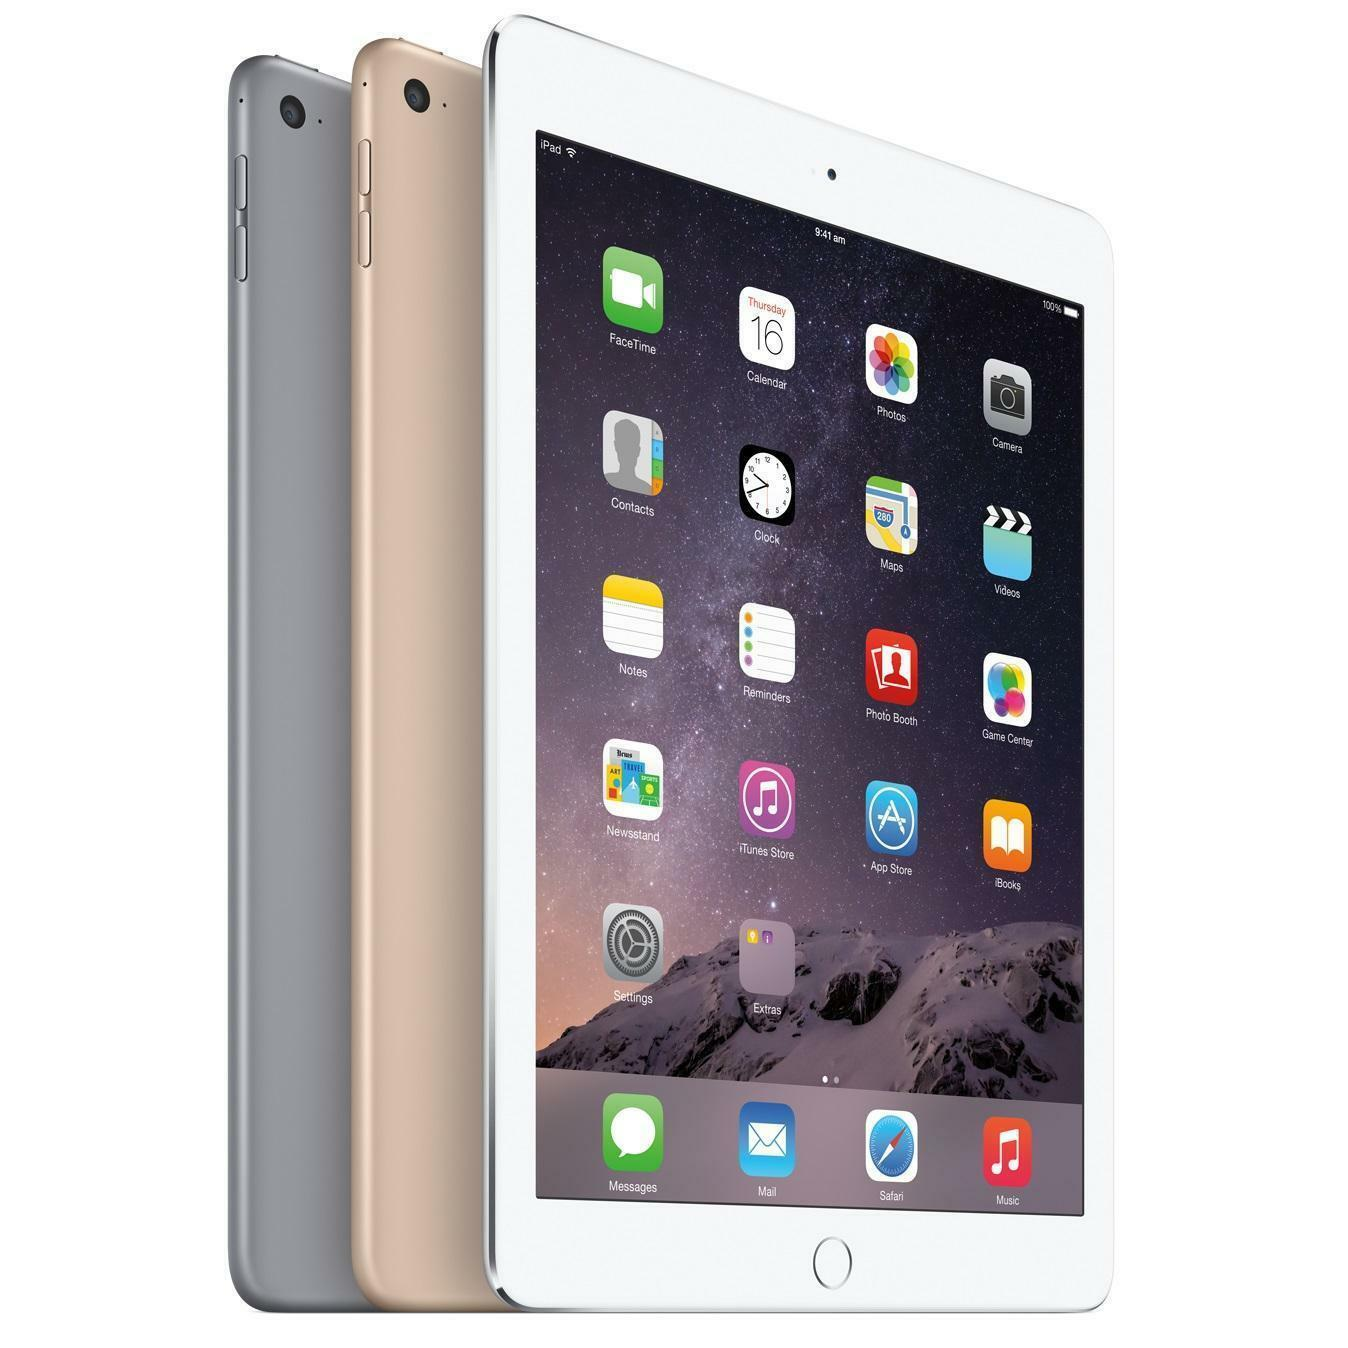 Apple iPad AIR 2 - 9.7 Inch Tablet VARIOUS - Wi-Fi  - 16 /  32GB / GRADED